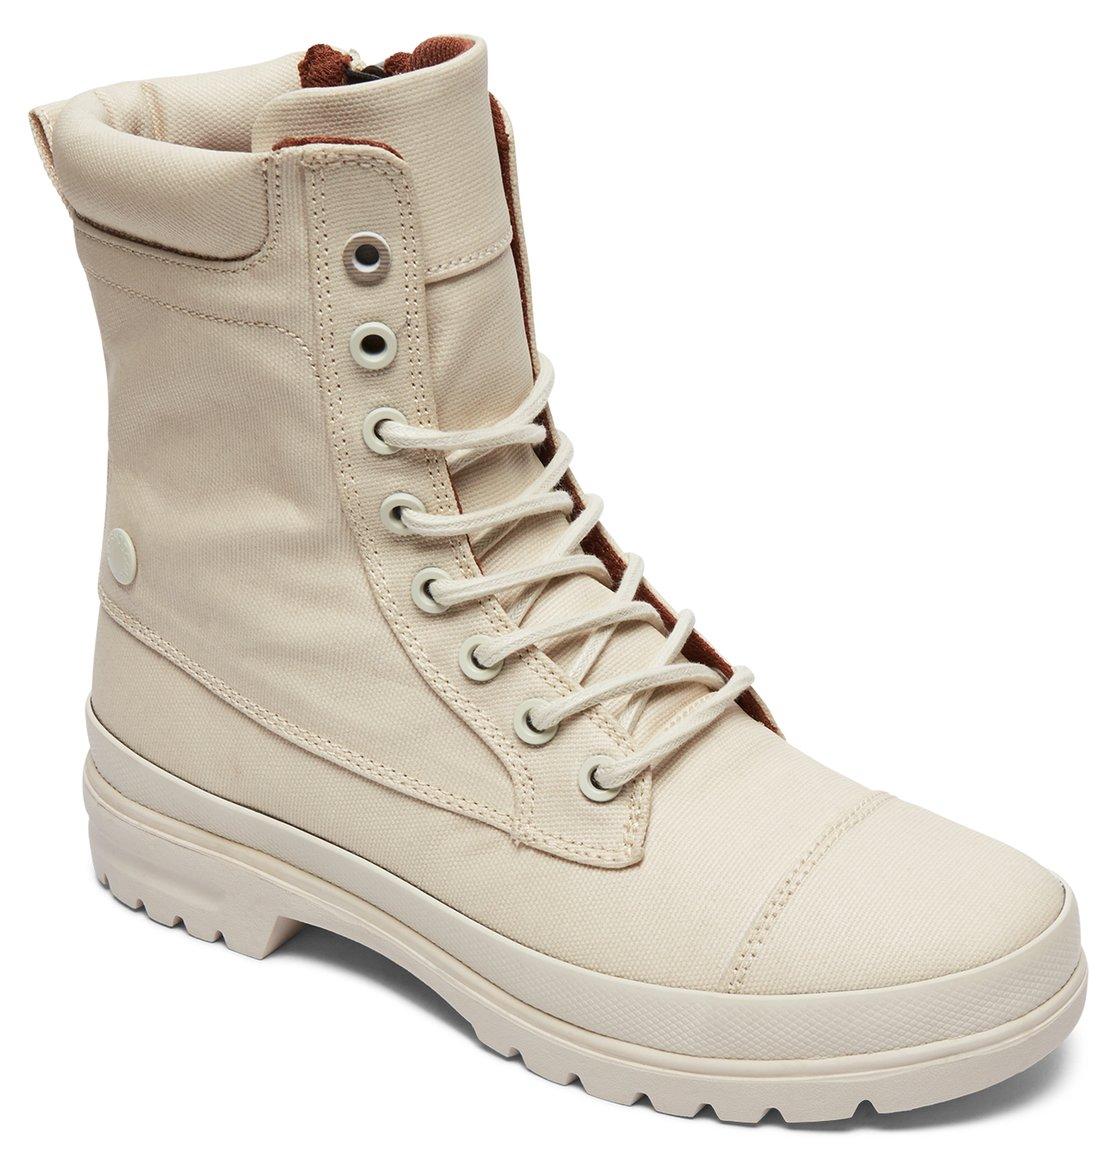 ADJB300011 SE TX Shoes Amnesti pour Bottes DC Femme q1xfg